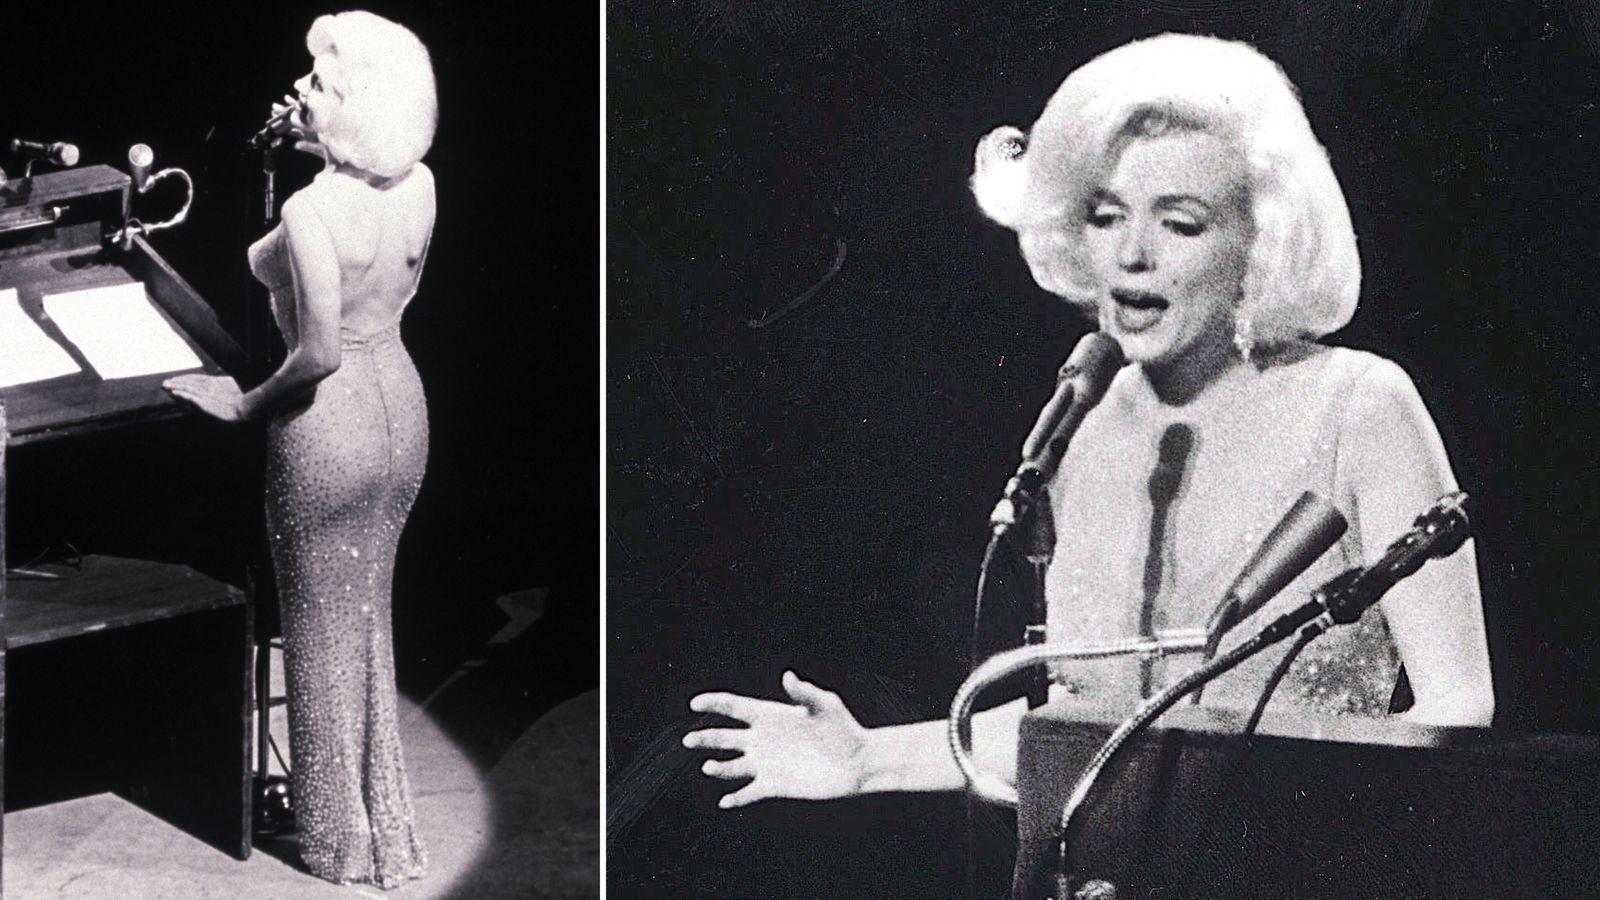 Marilyn Monroe S Happy Birthday Dress Sold For 4 8m